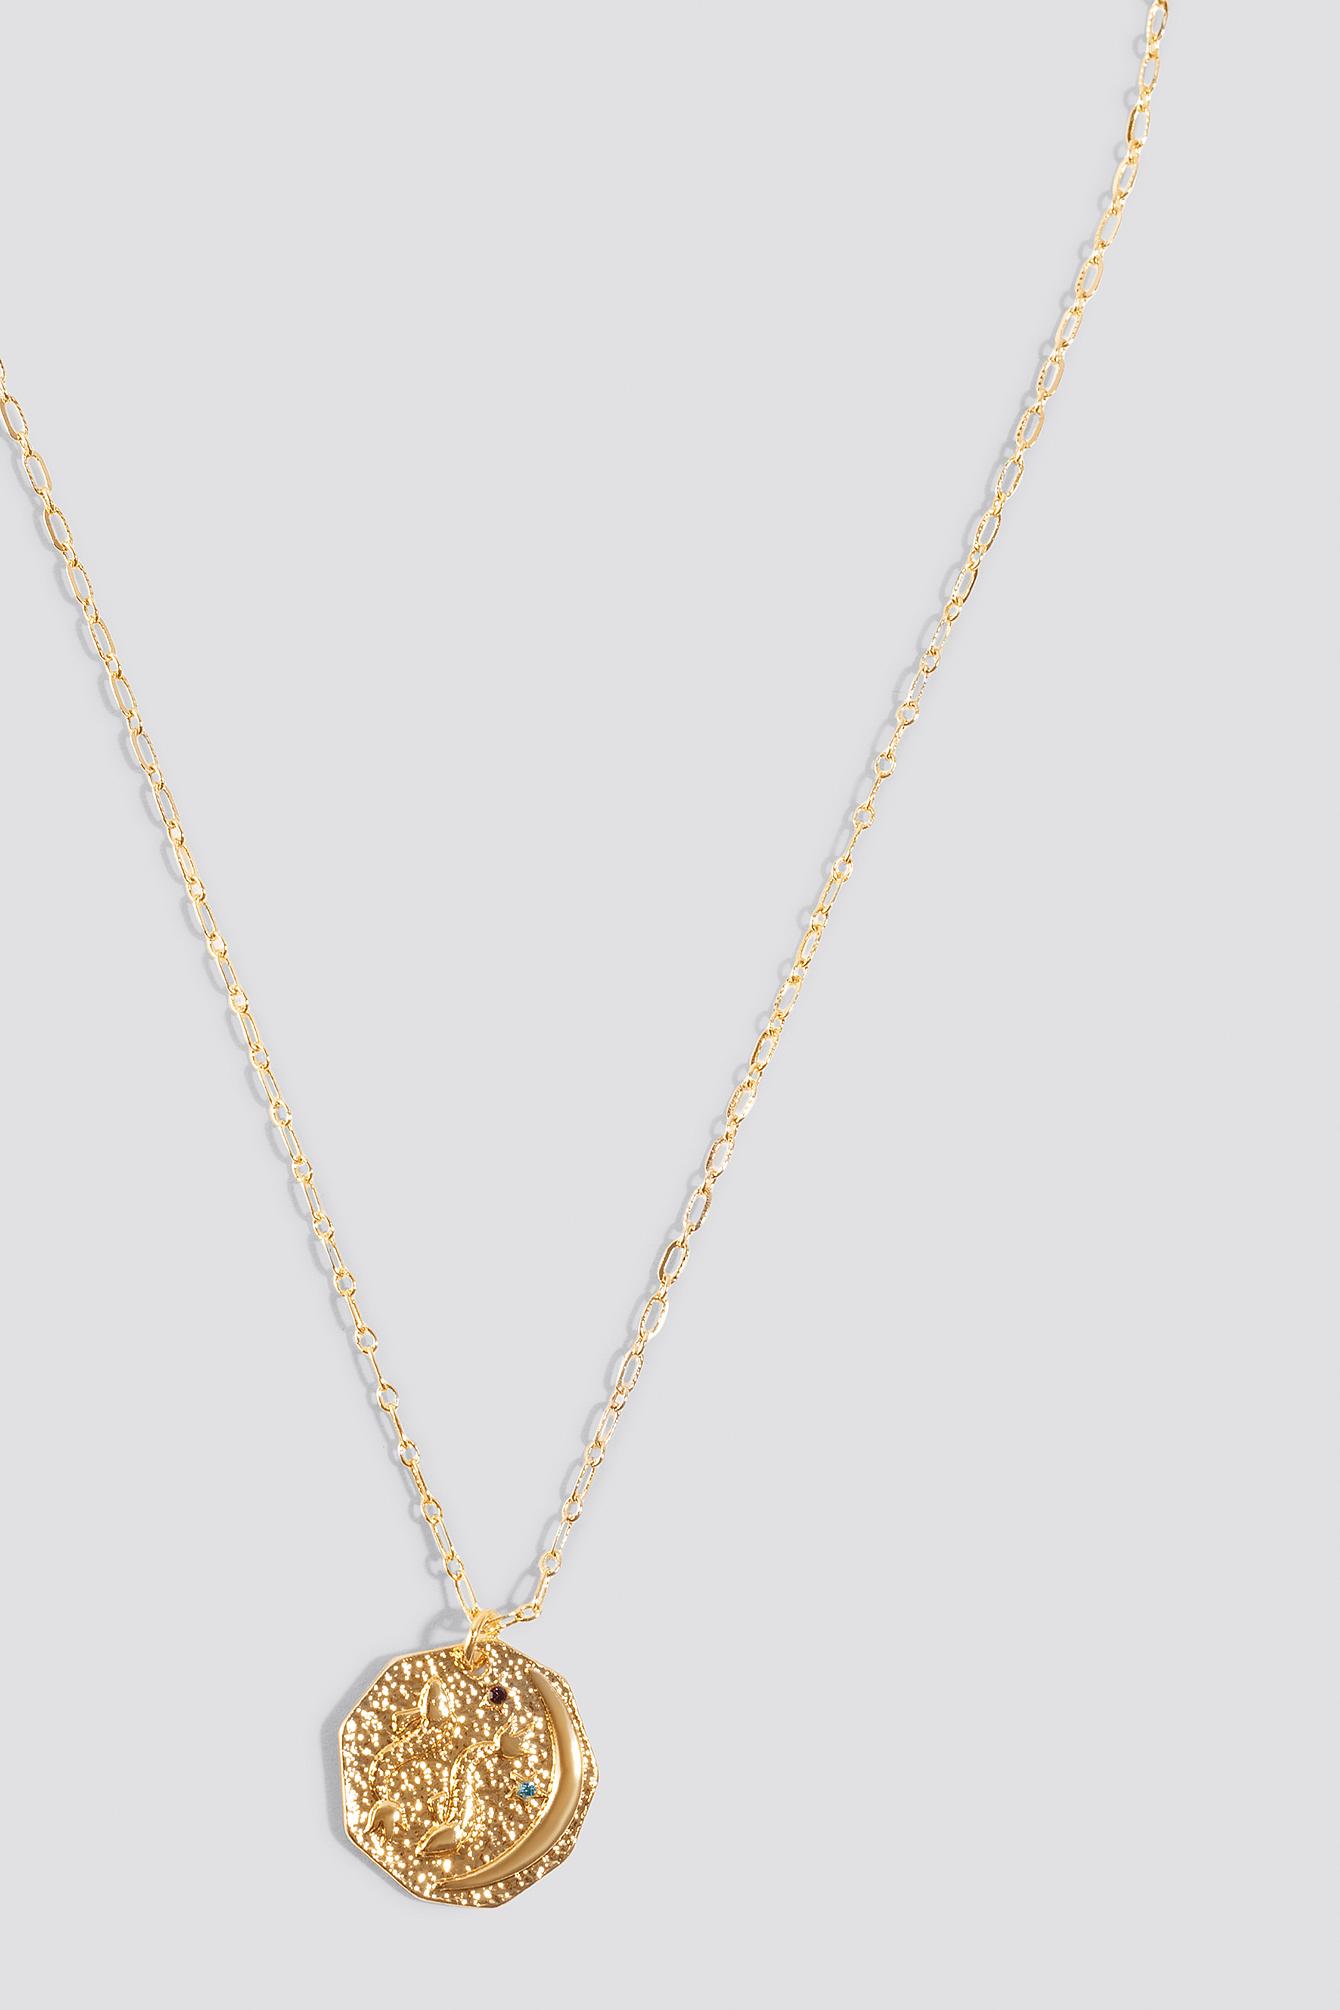 Structured Zodiac Pisces Necklace NA-KD.COM